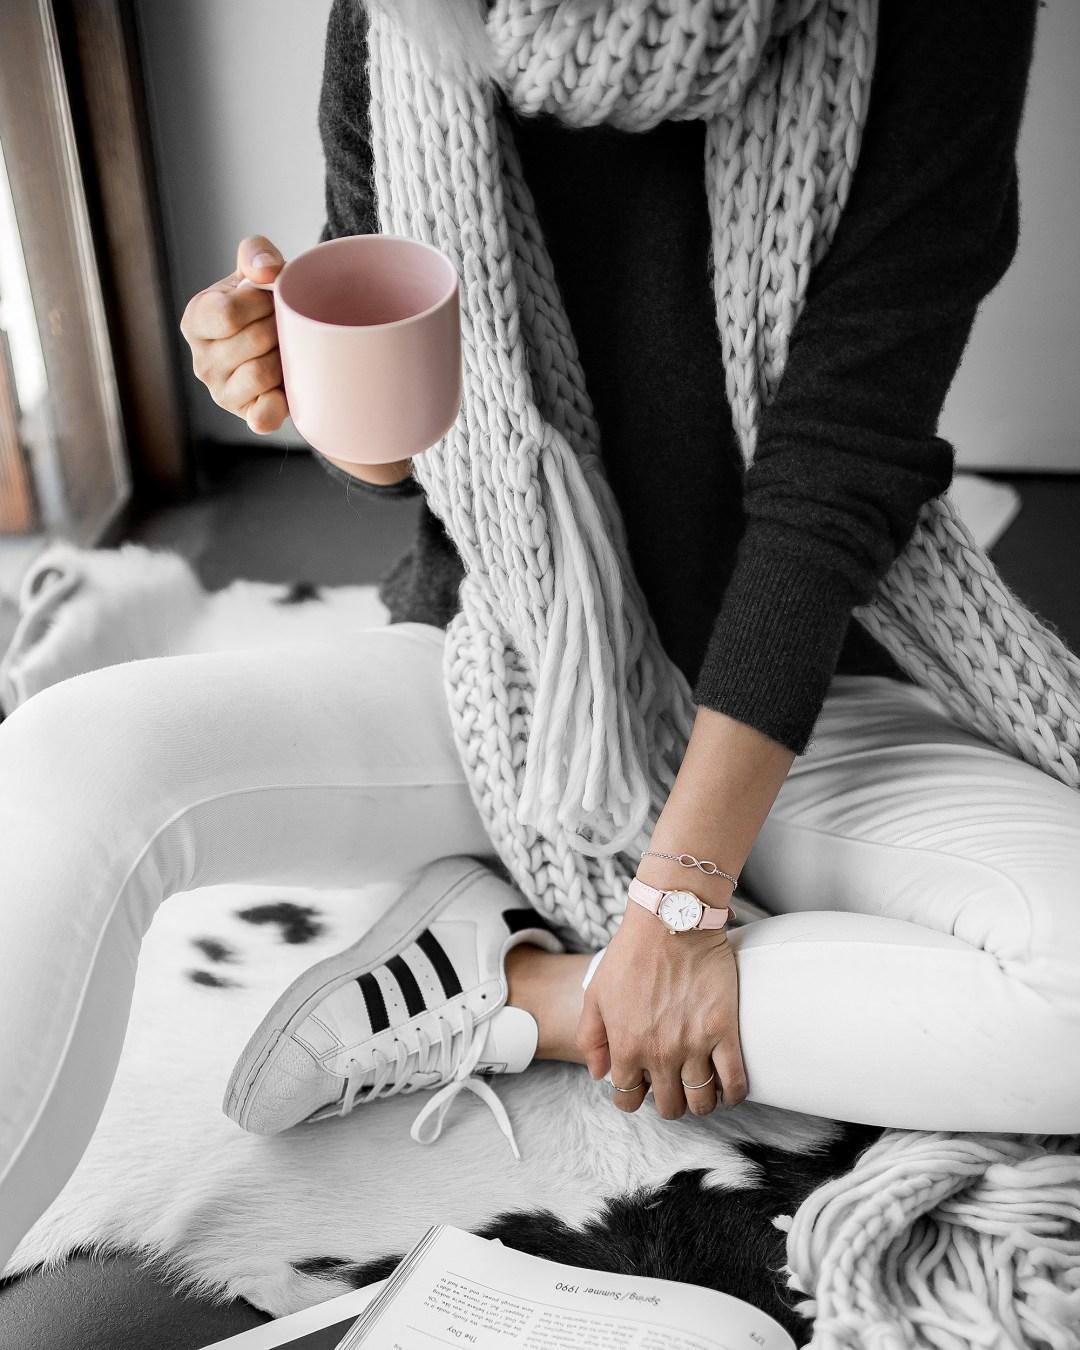 chunky-scarf-adidas-superstar-coffee-morning-inspiration-8-copy